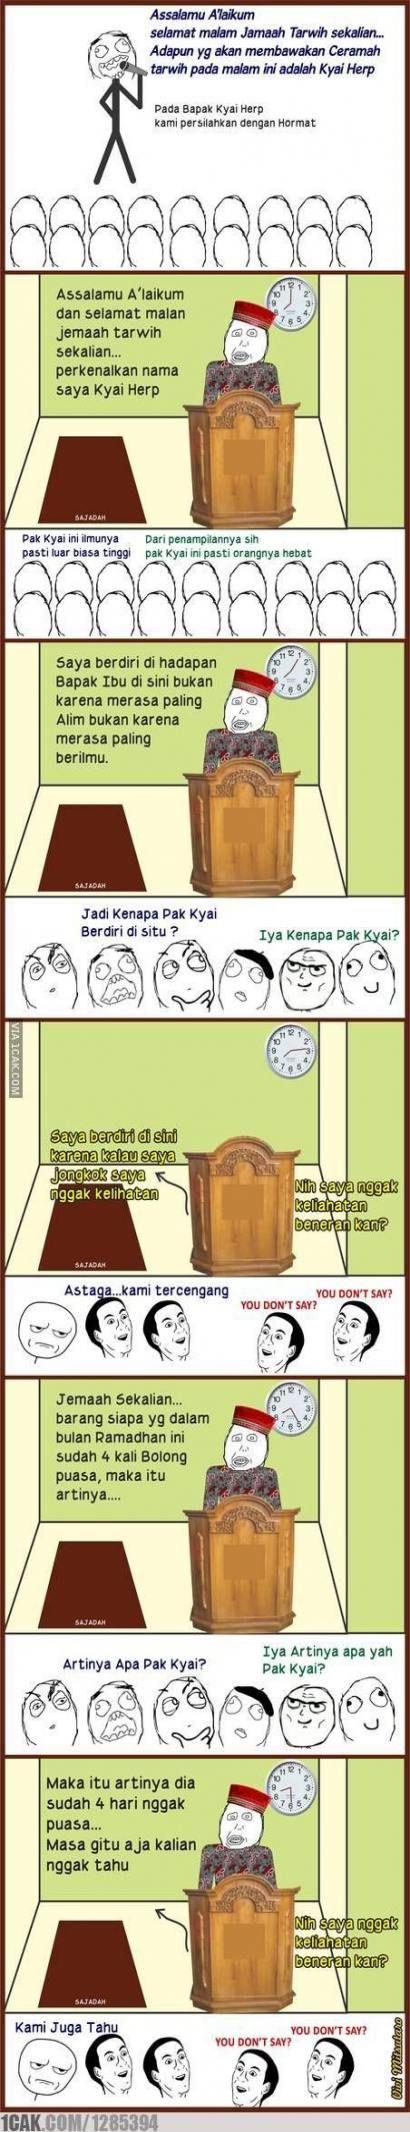 Memes Indonesia Herp 15 Ideas memes New memes, Best